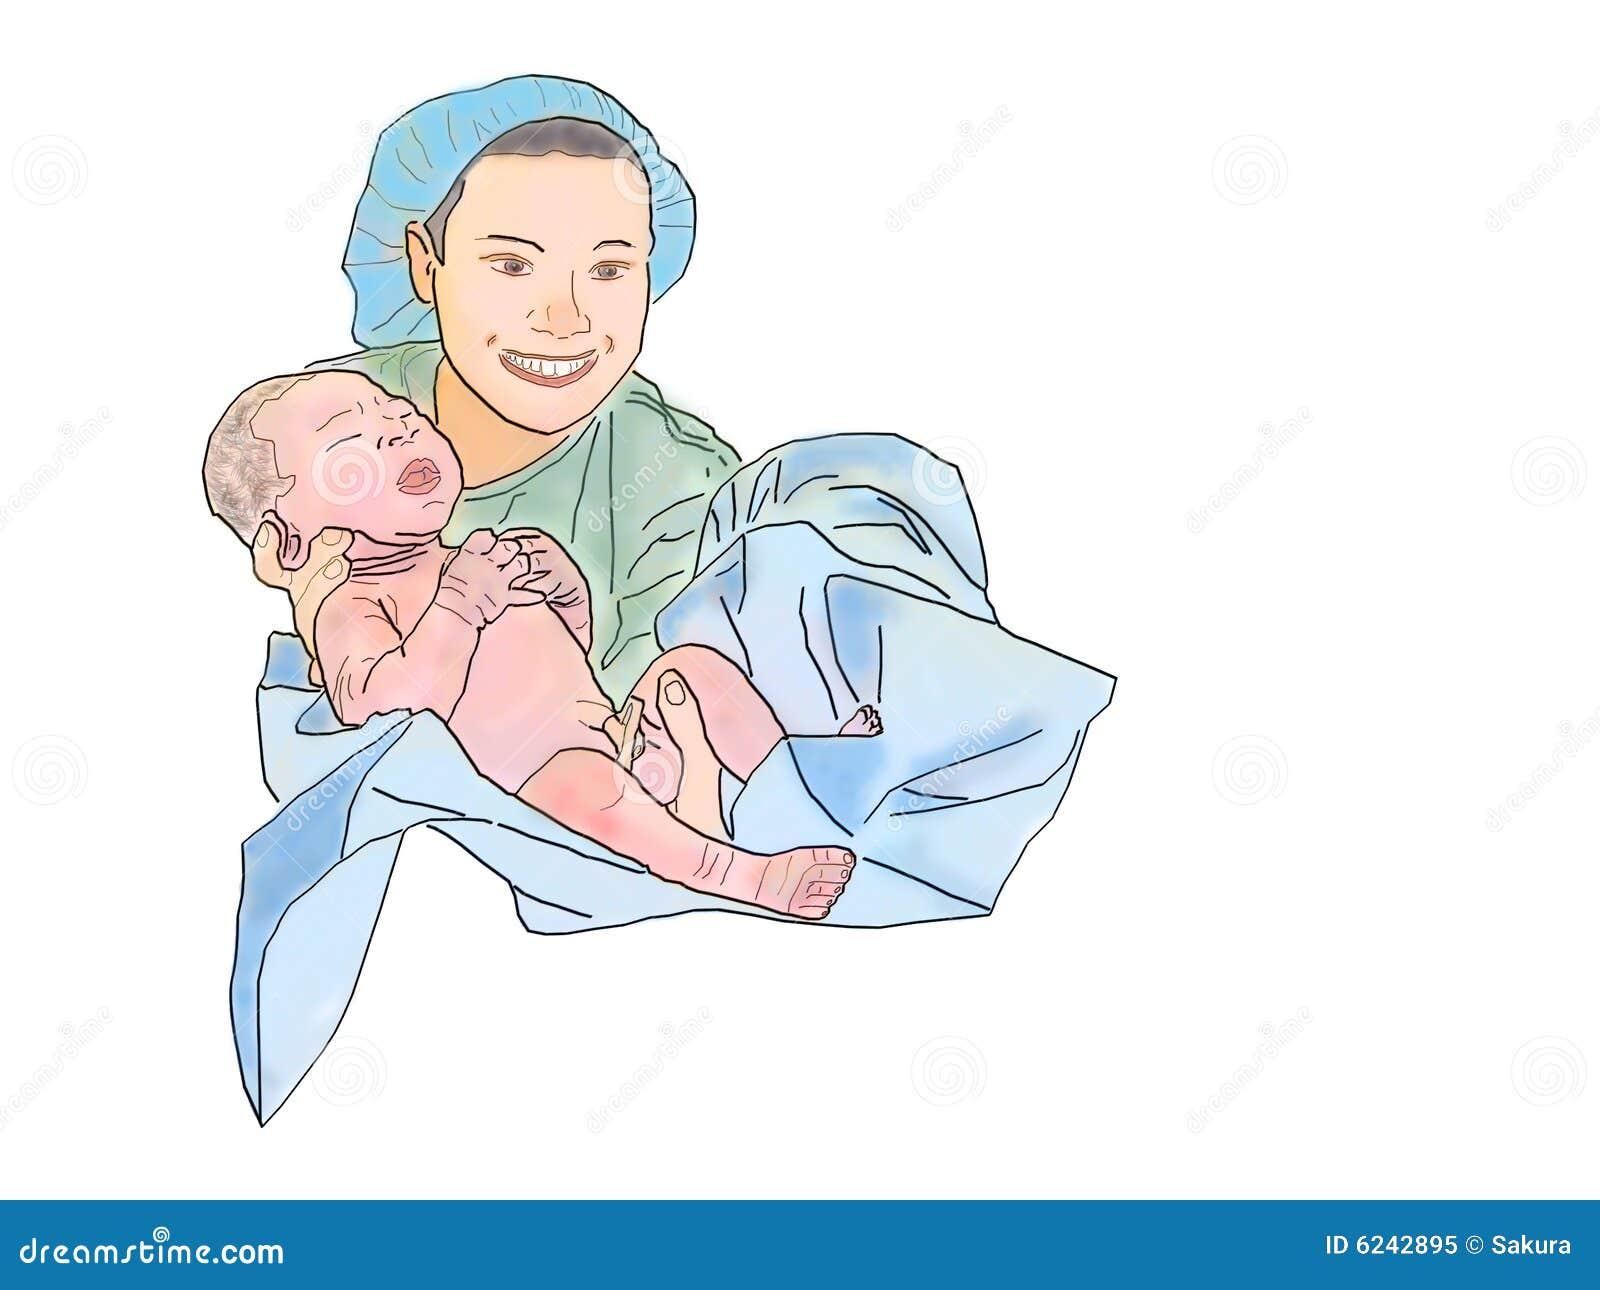 midwife cartoons  illustrations  u0026 vector stock images